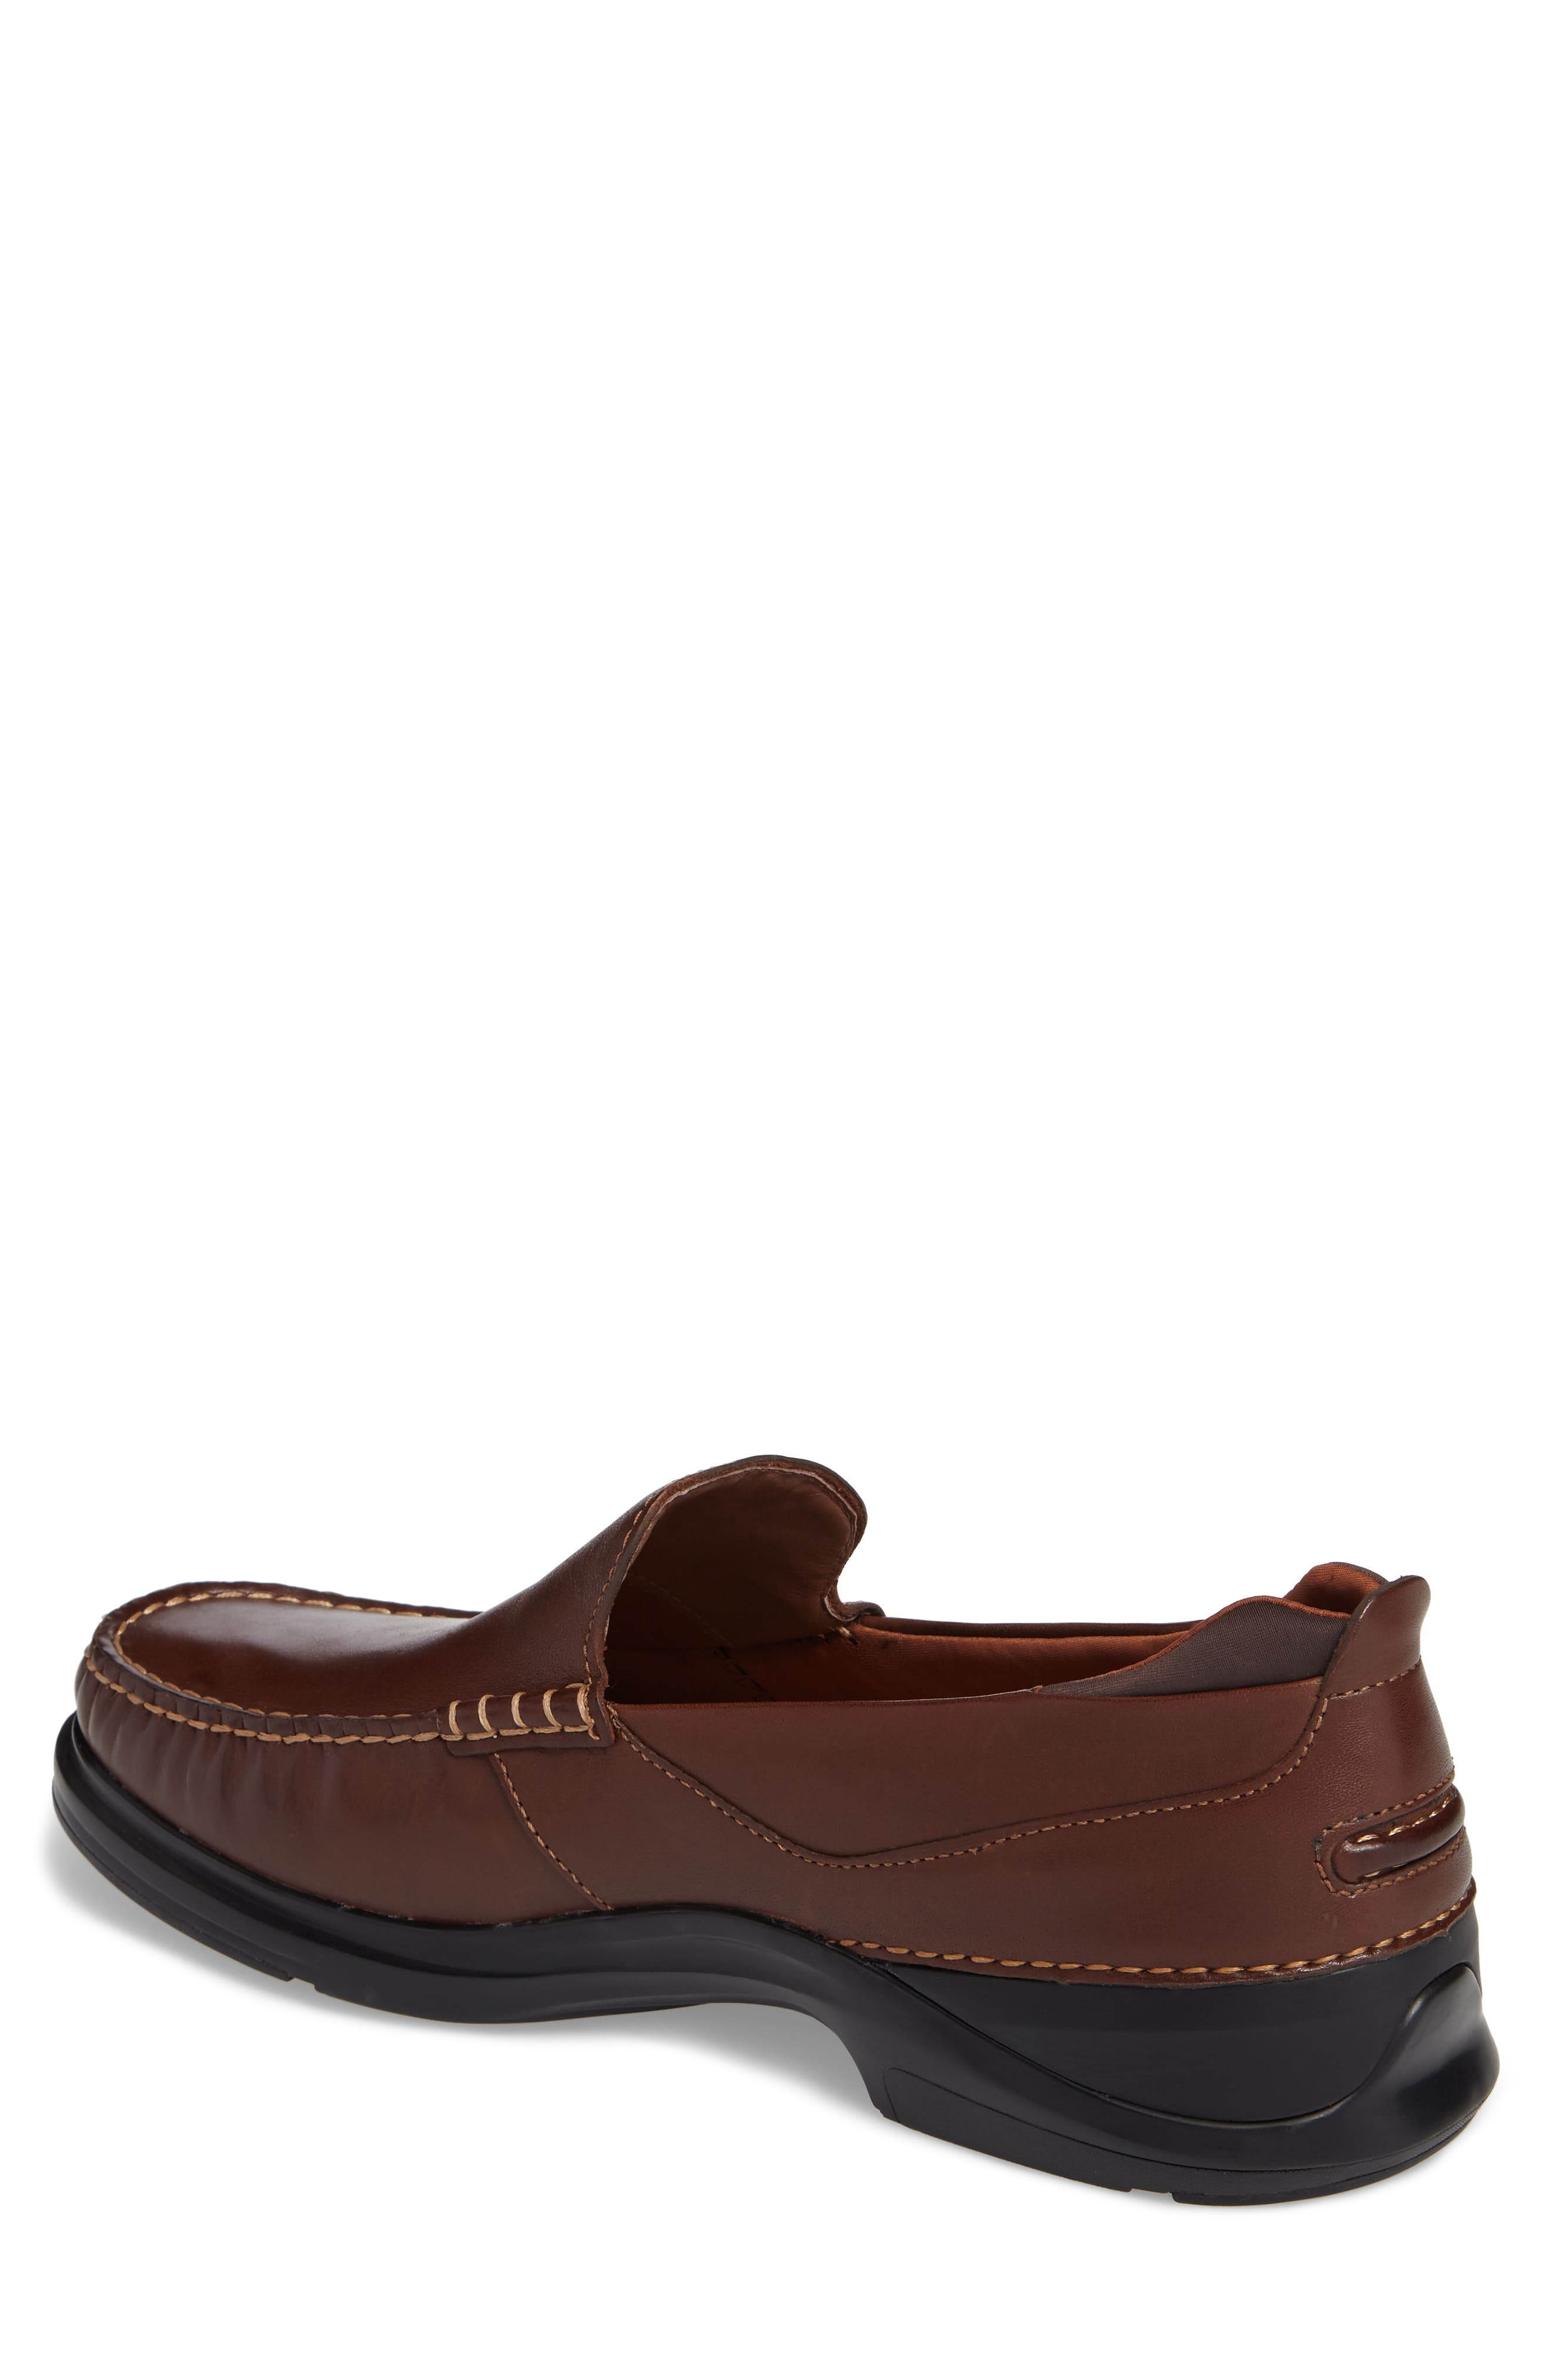 Bancroft Loafer,                             Alternate thumbnail 2, color,                             Harvest Brown Leather